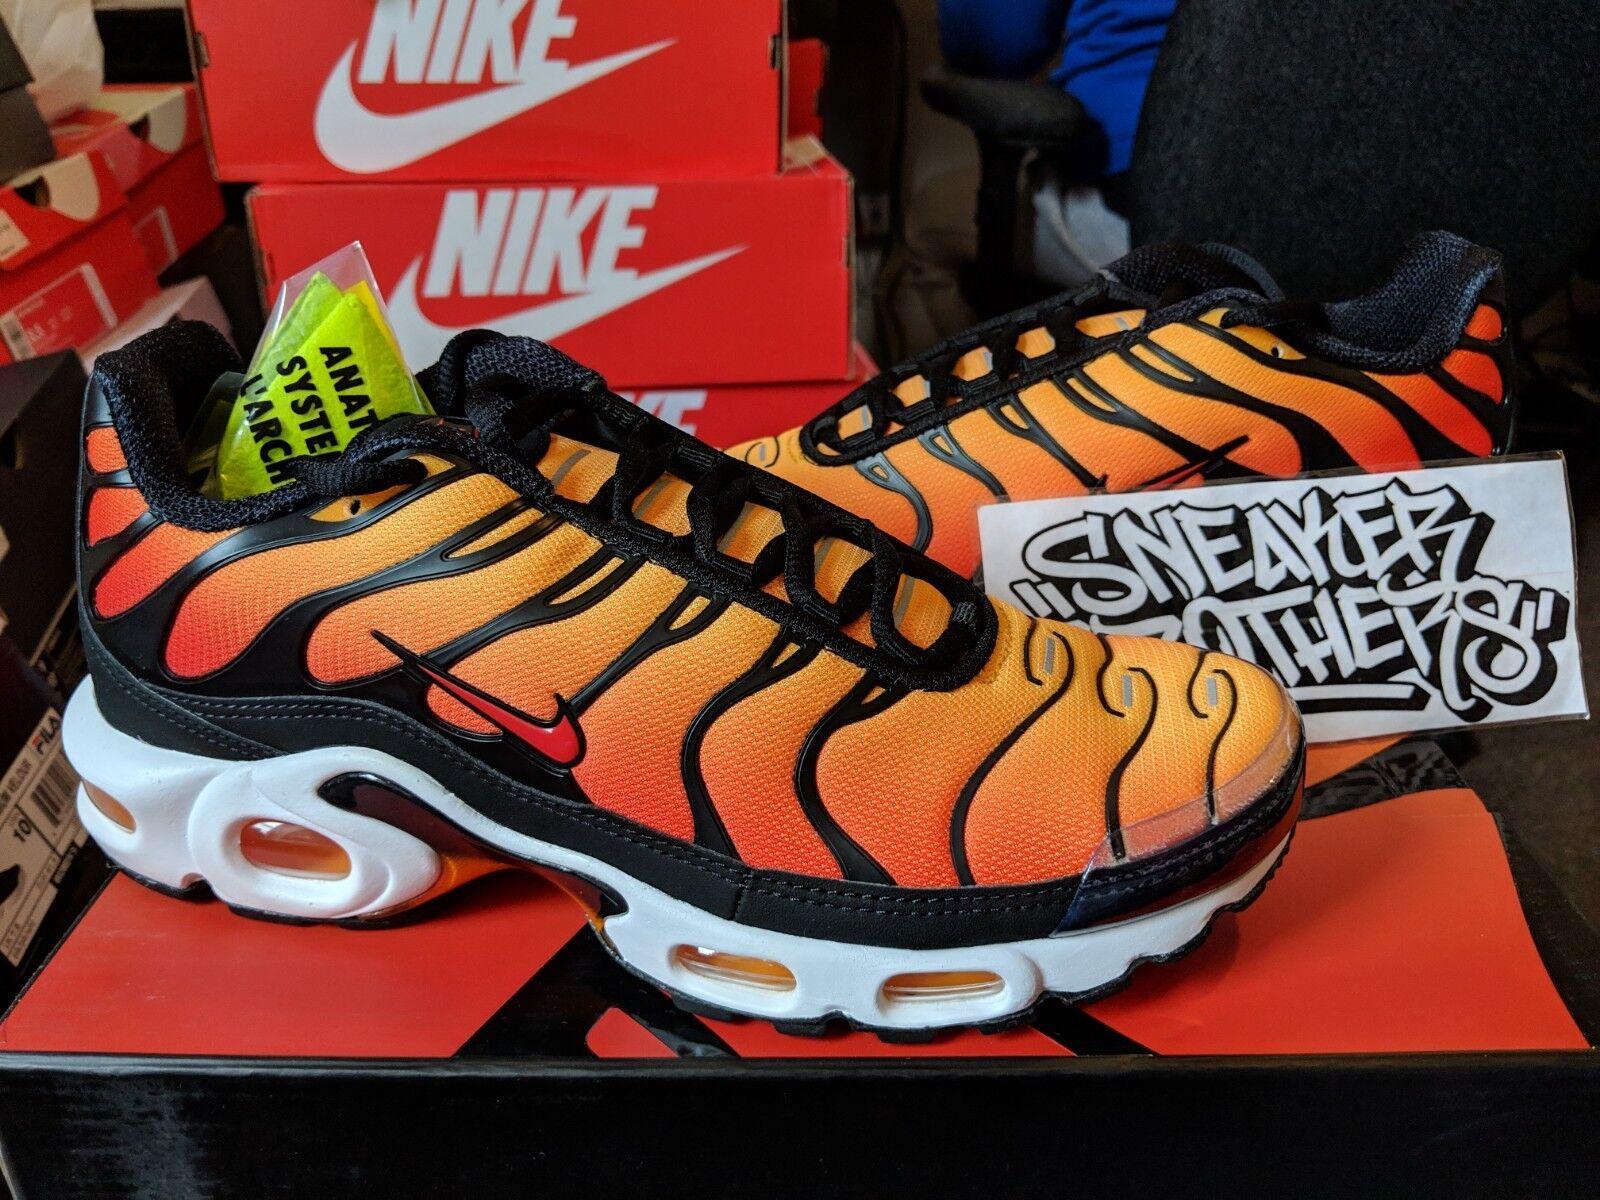 f7b1871a53 Nike Air Max Plus Sunset Black Pimento Ceramic Resin orange BQ4629-001 TN  OG ntalgh104-Athletic Shoes